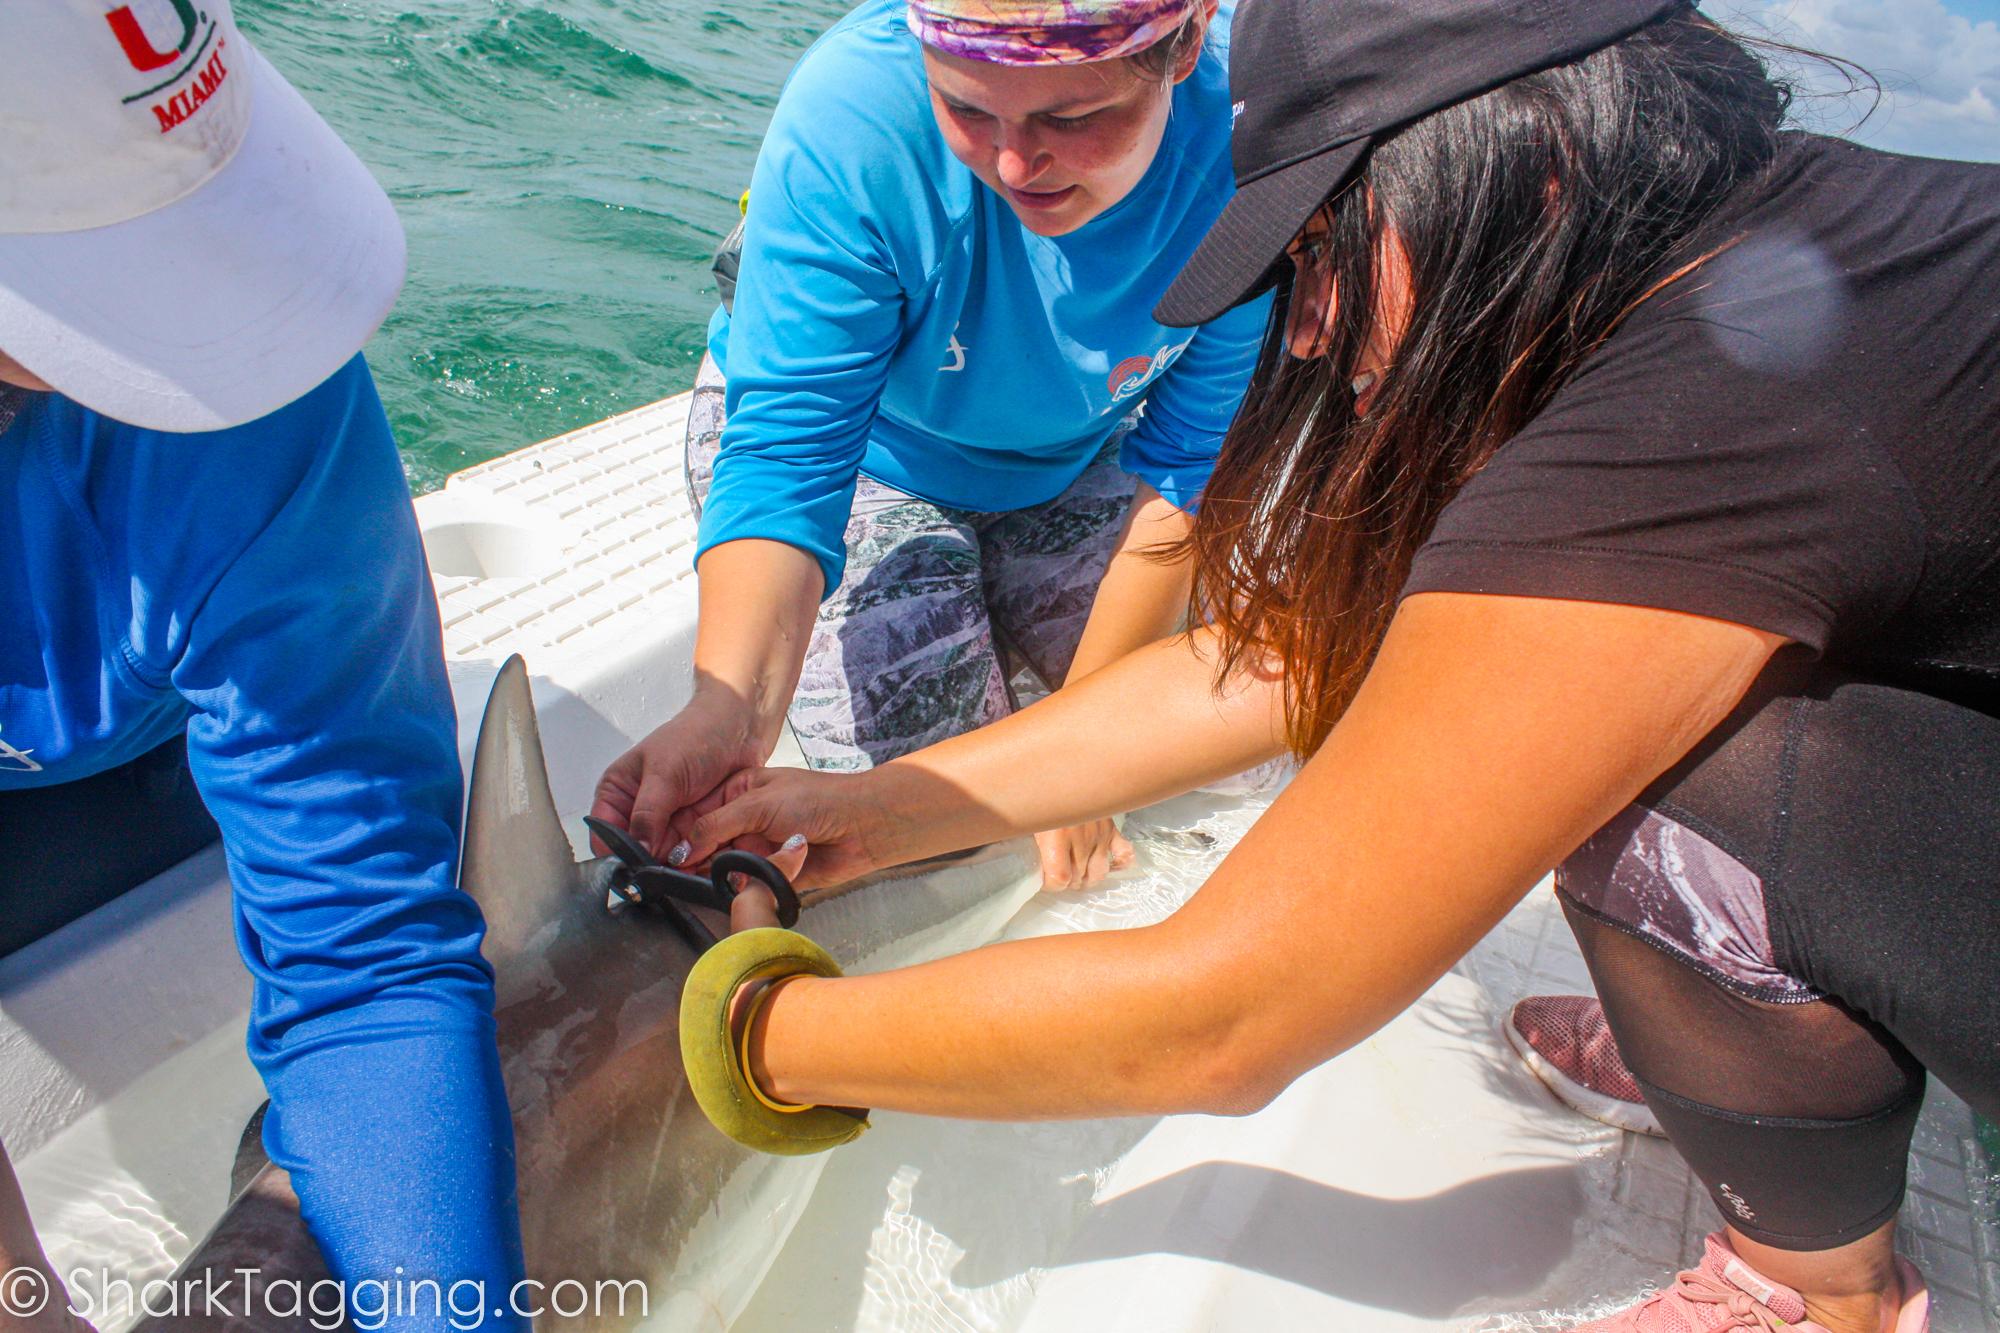 Doer Estrella clipping a shark for research| Photo Credit: @sharktagging.com